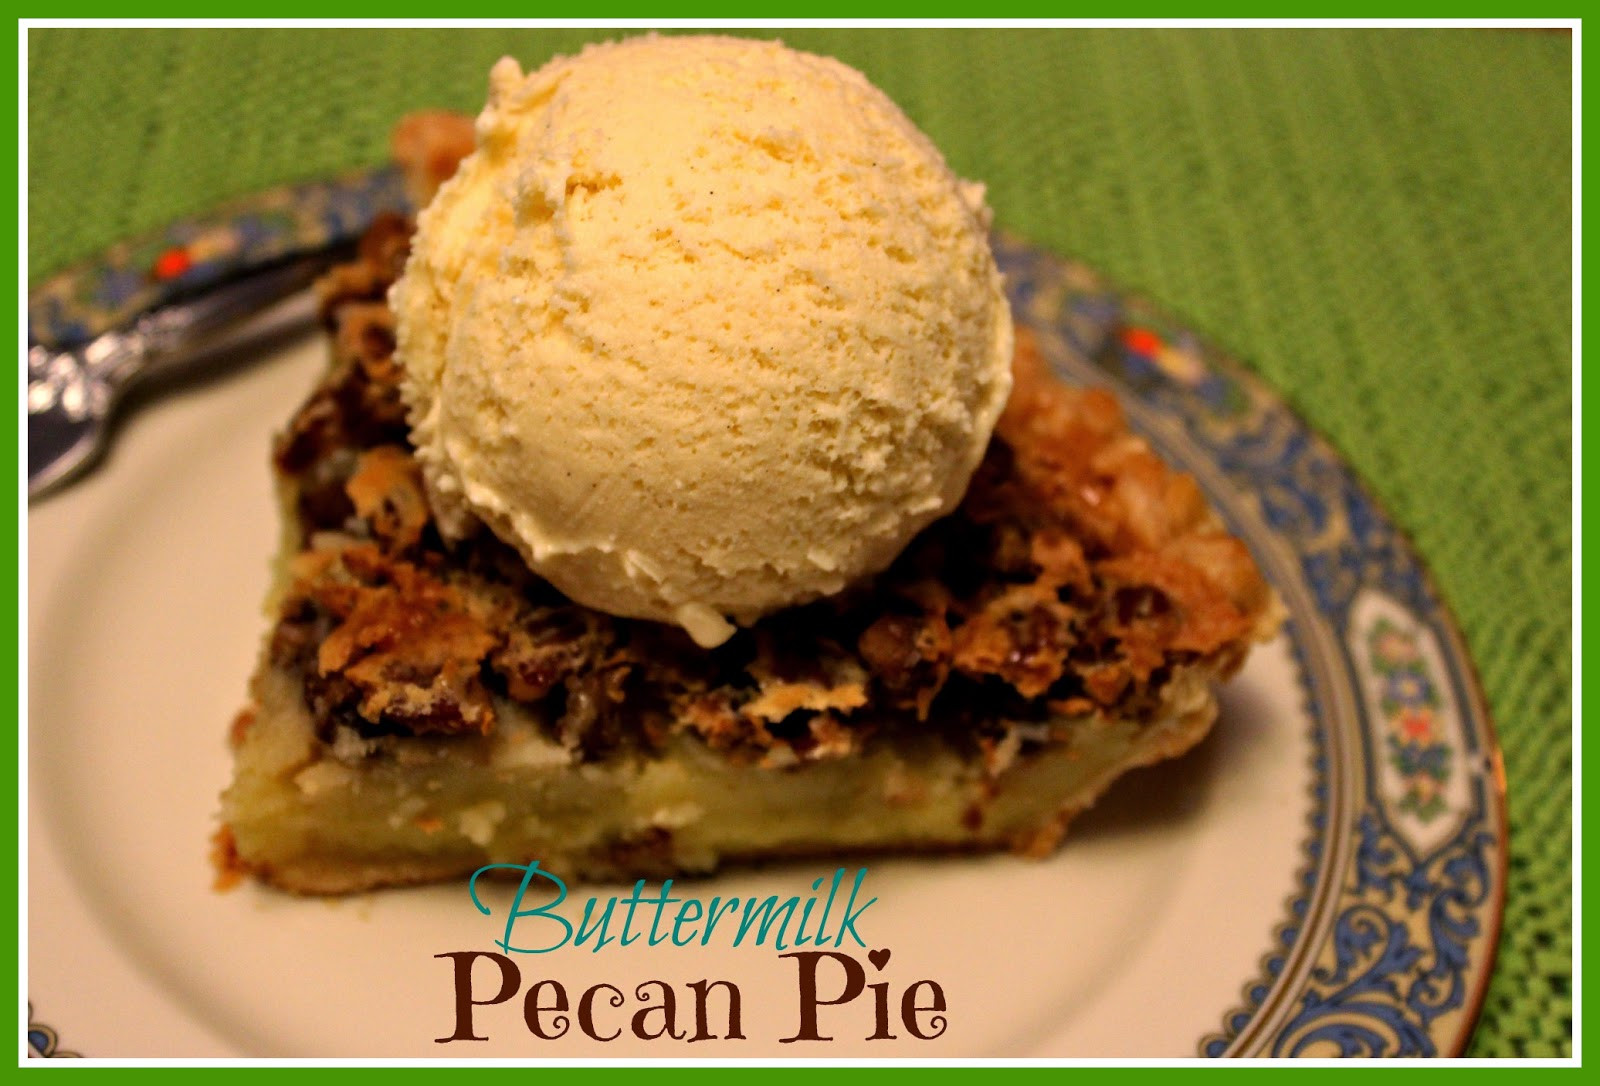 Buttermilk Pecan Pie  Sweet Tea and Cornbread Buttermilk Pecan Pie